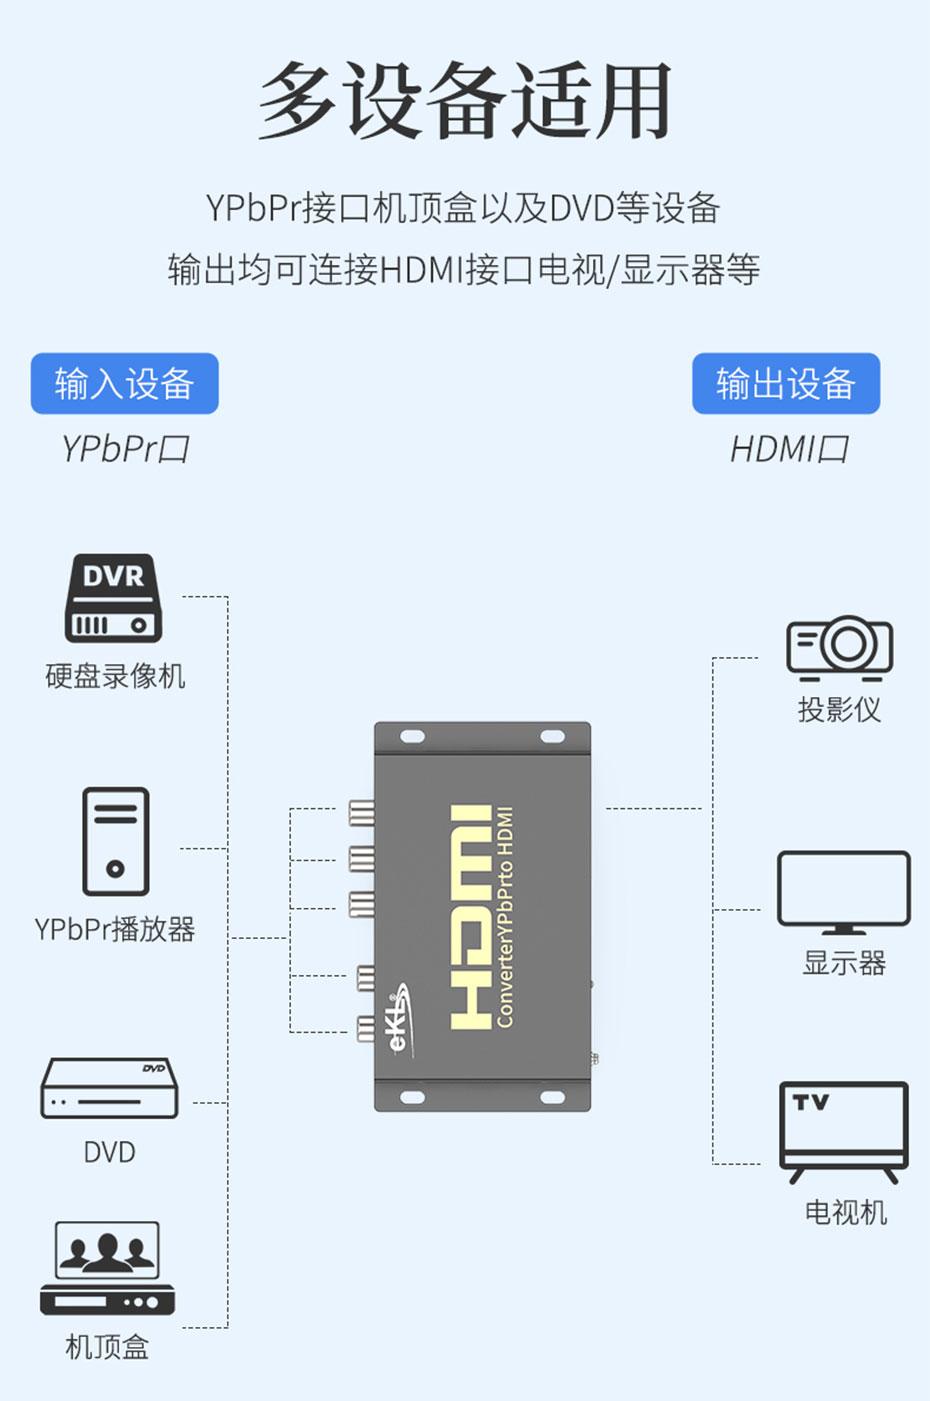 YPbPr(色差)转HDMI转换器YH连接使用示意图